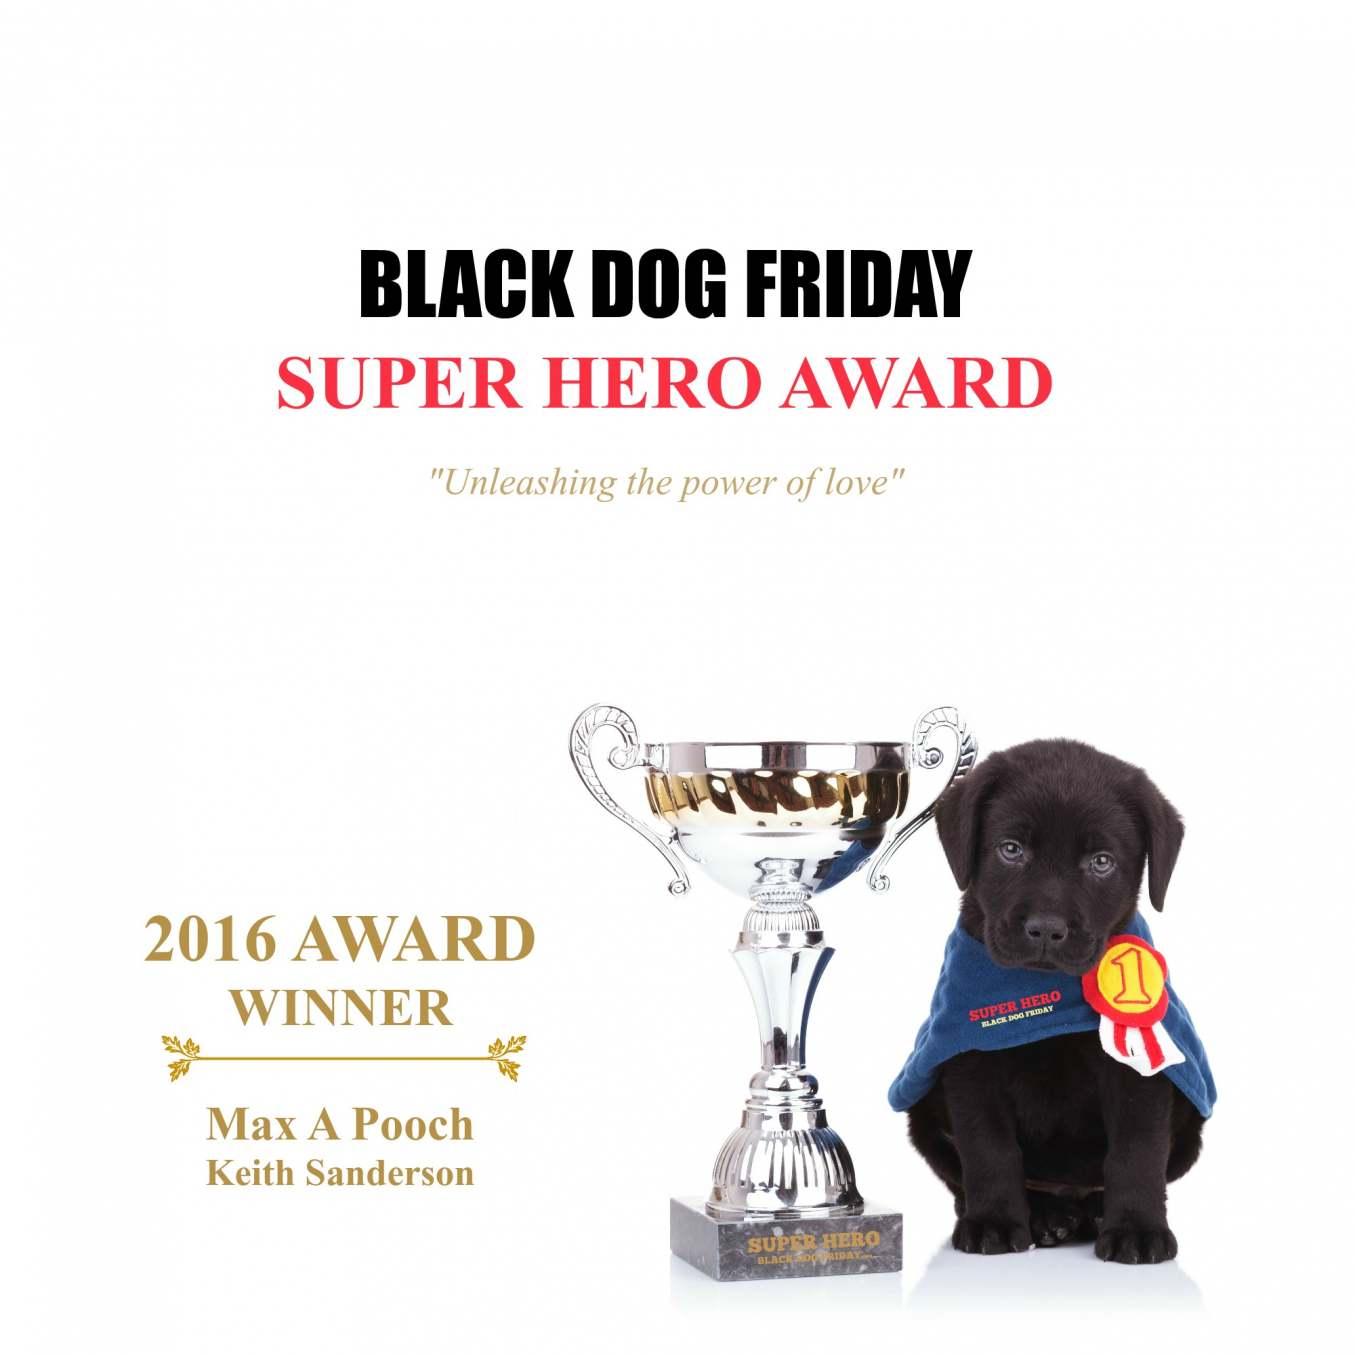 Max A Pooch receives Black Dog Friday Super Hero Award